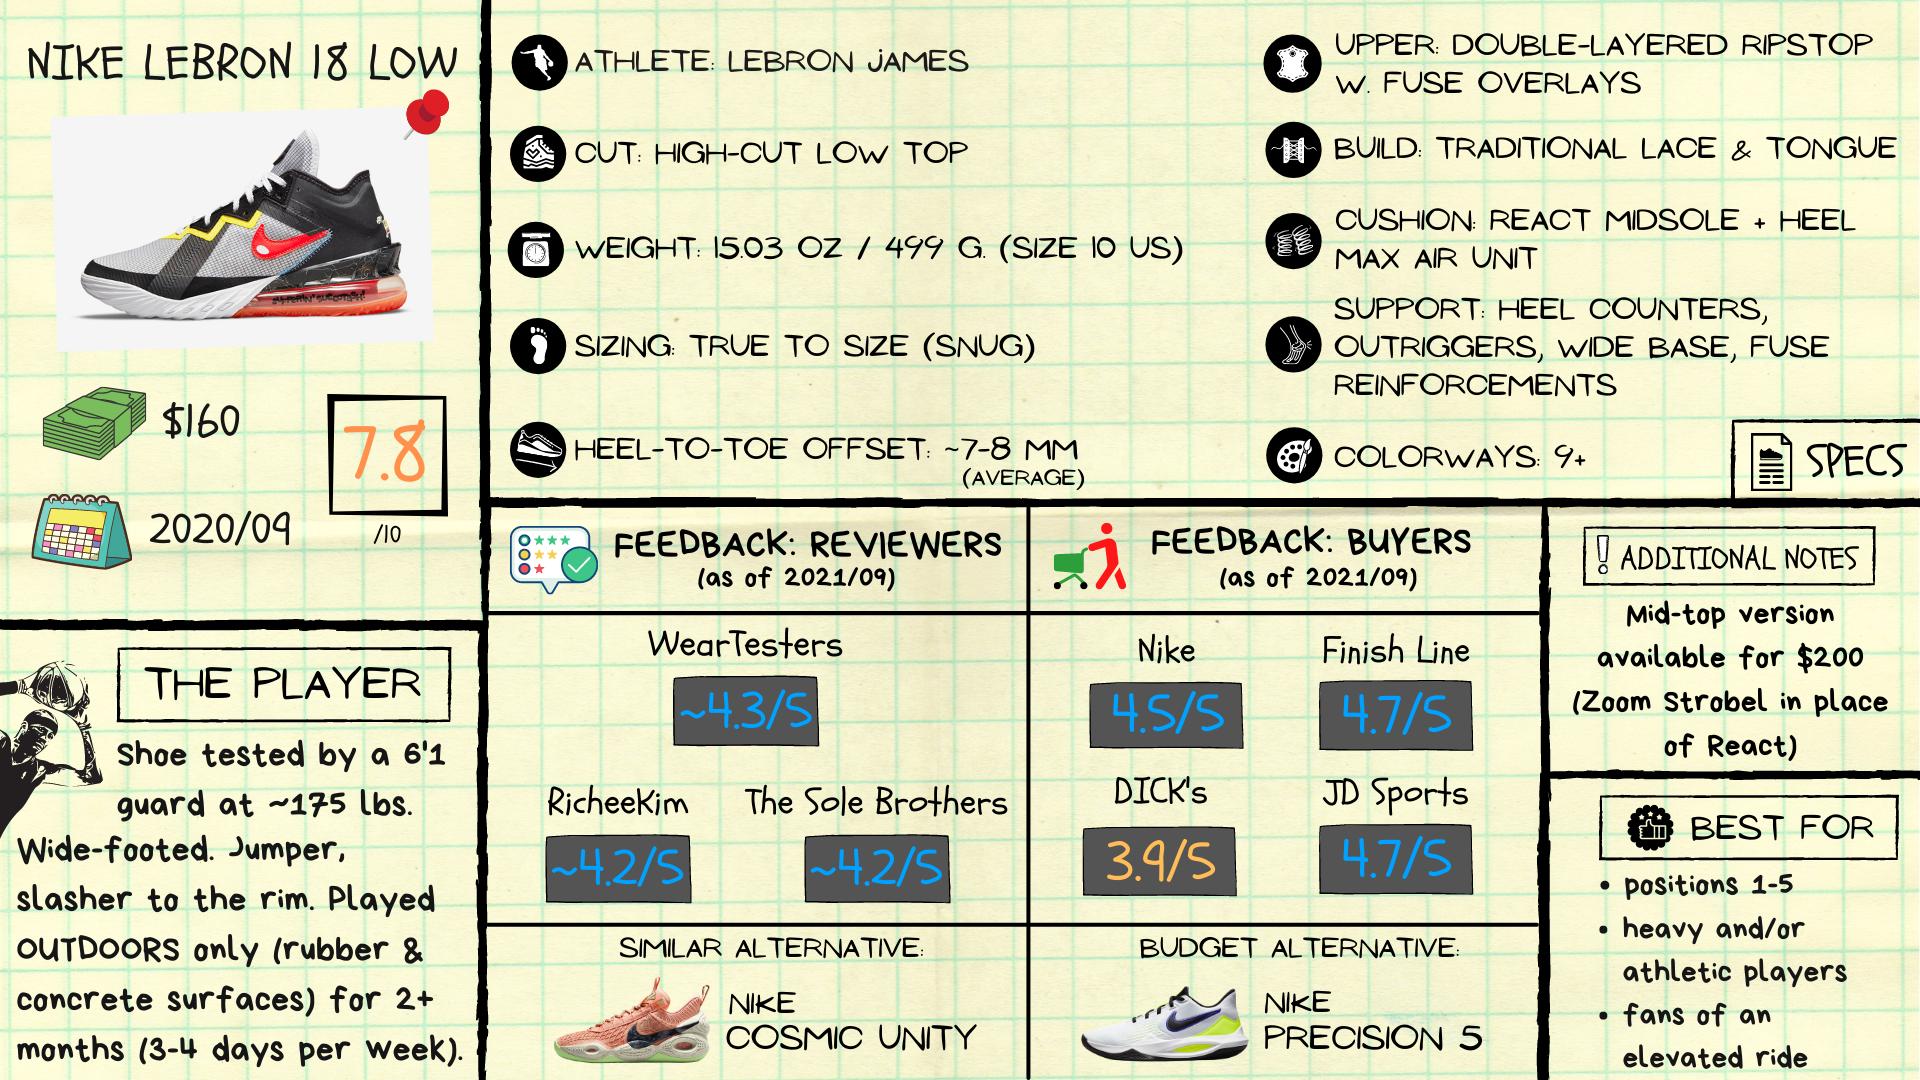 LeBron 18 Low Review: Spec Sheet